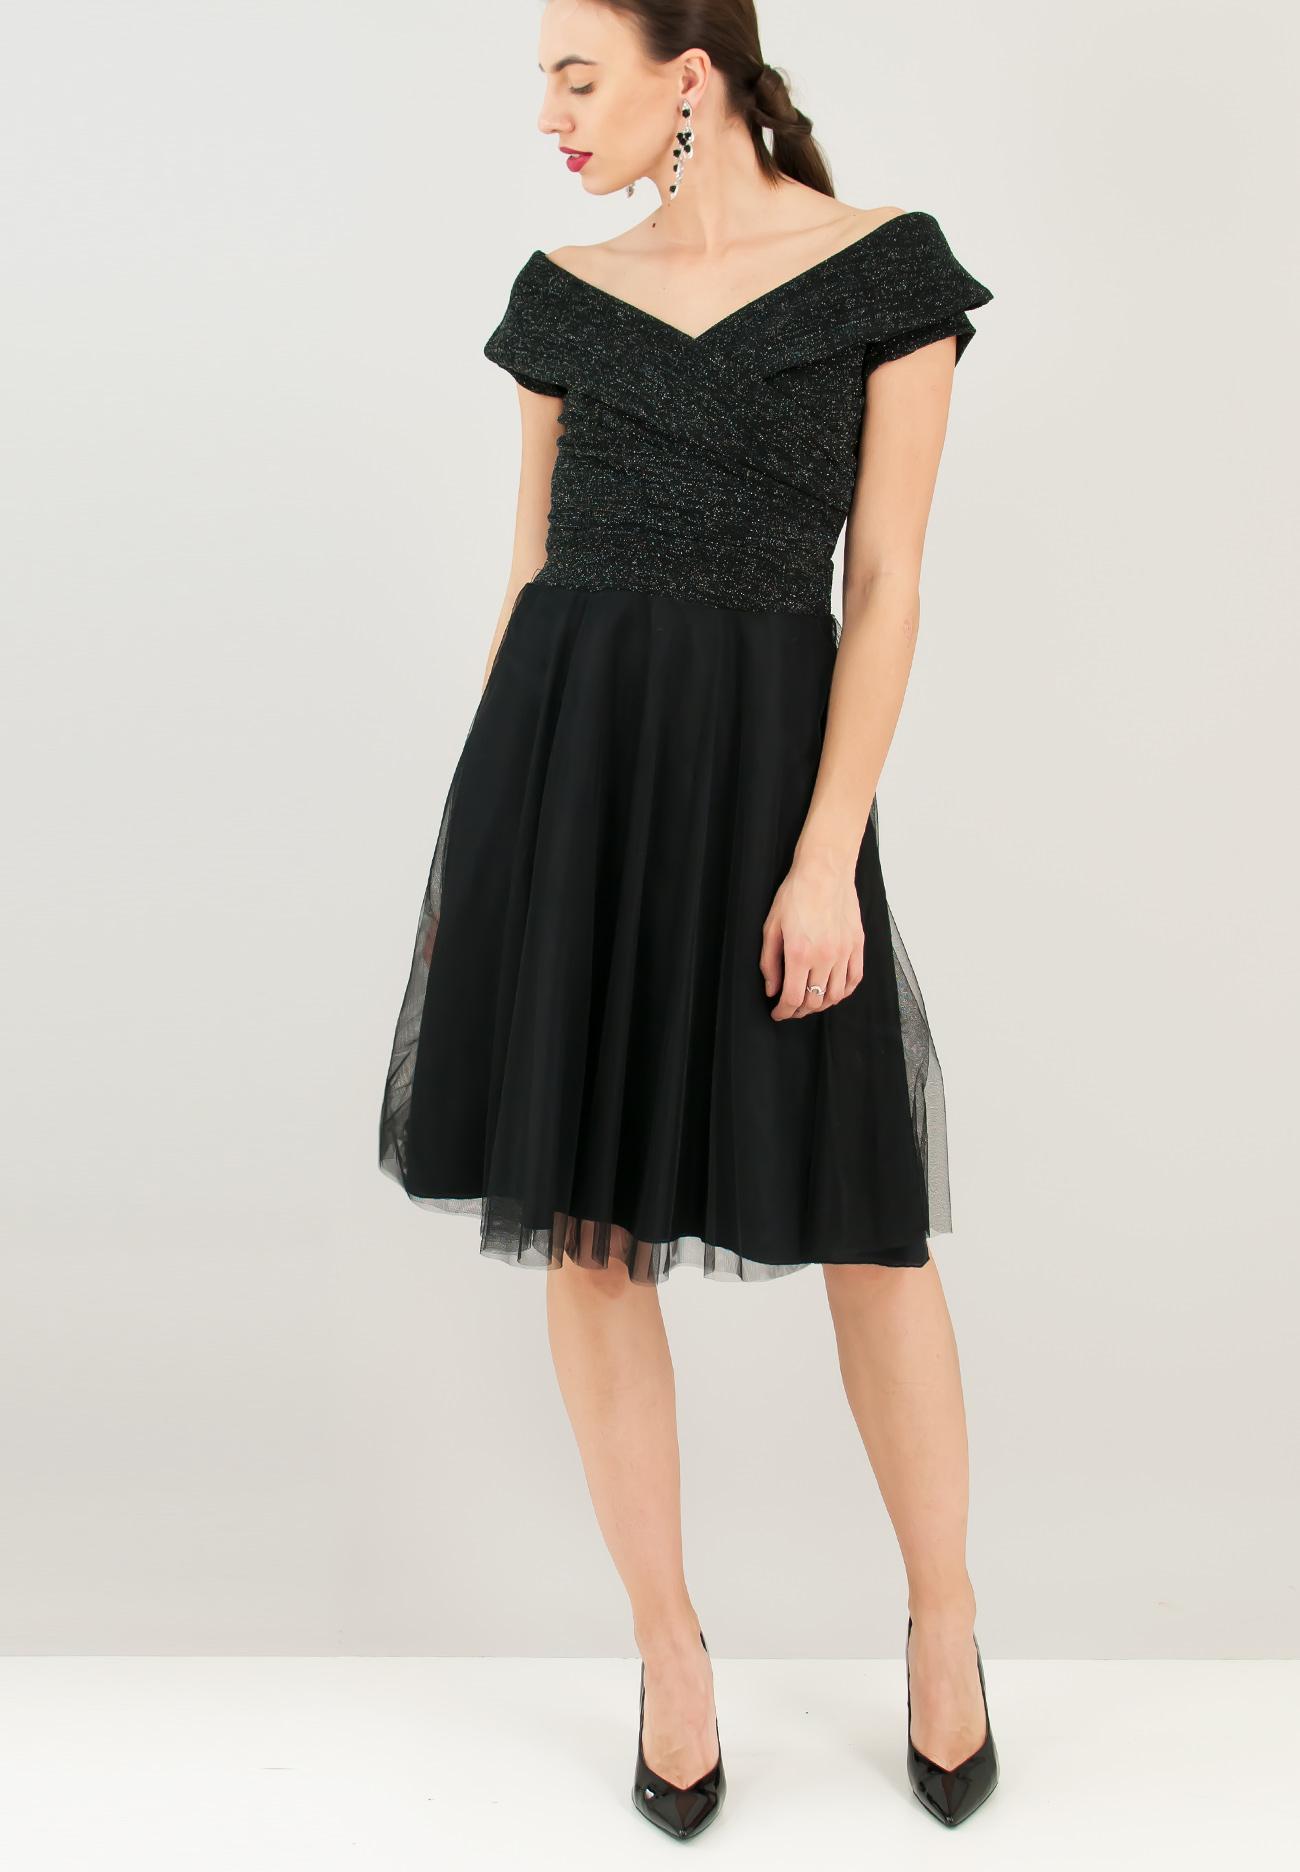 22fb3dd0e706 Φόρεμα με λούρεξ μπούστο - ZIC ZAC